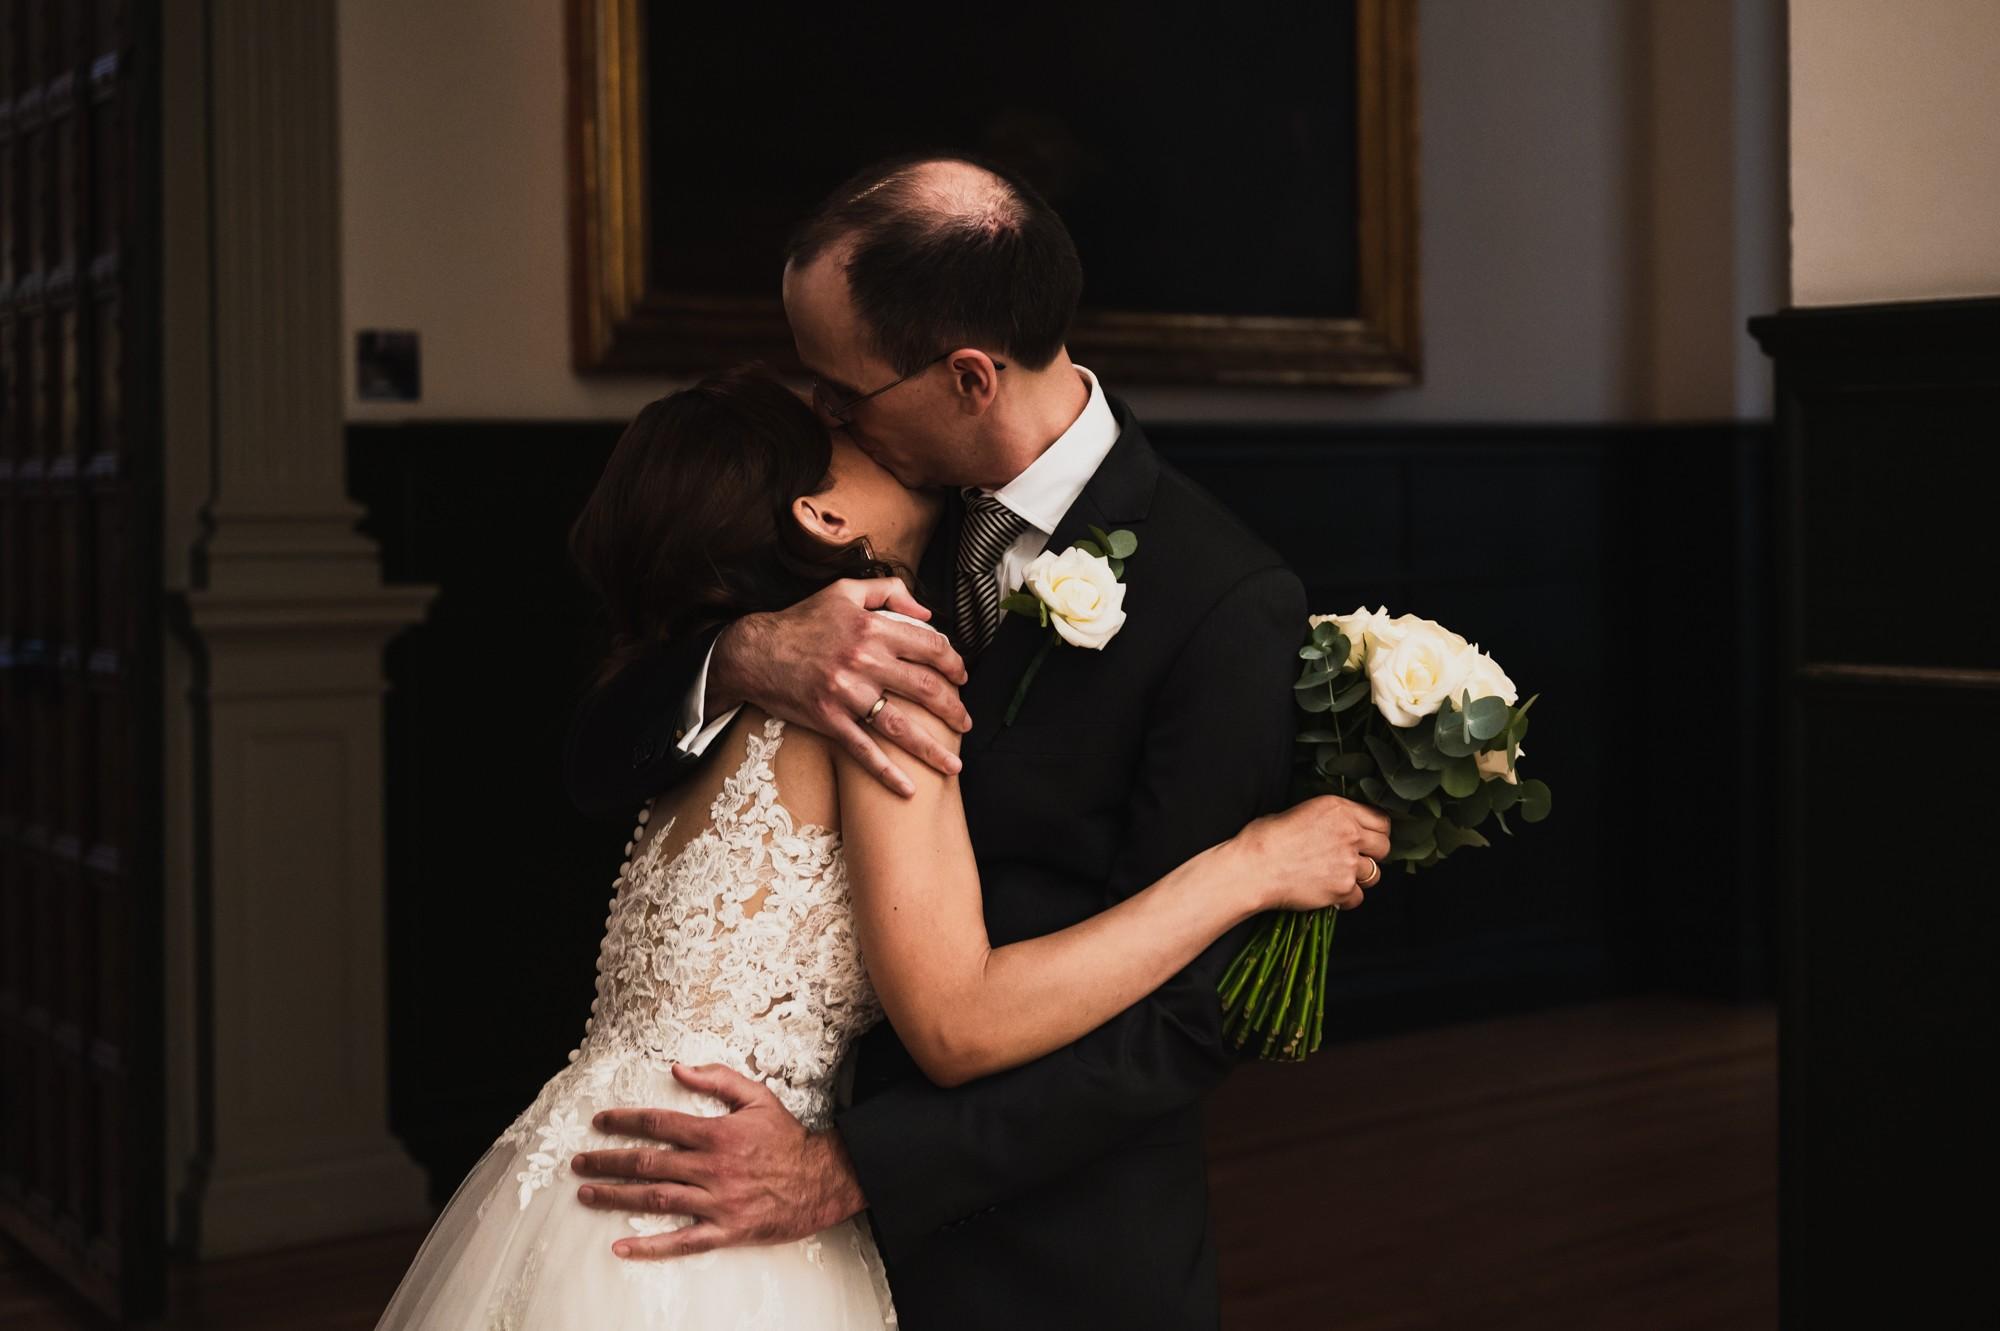 Reportaje de boda en bilbao 10